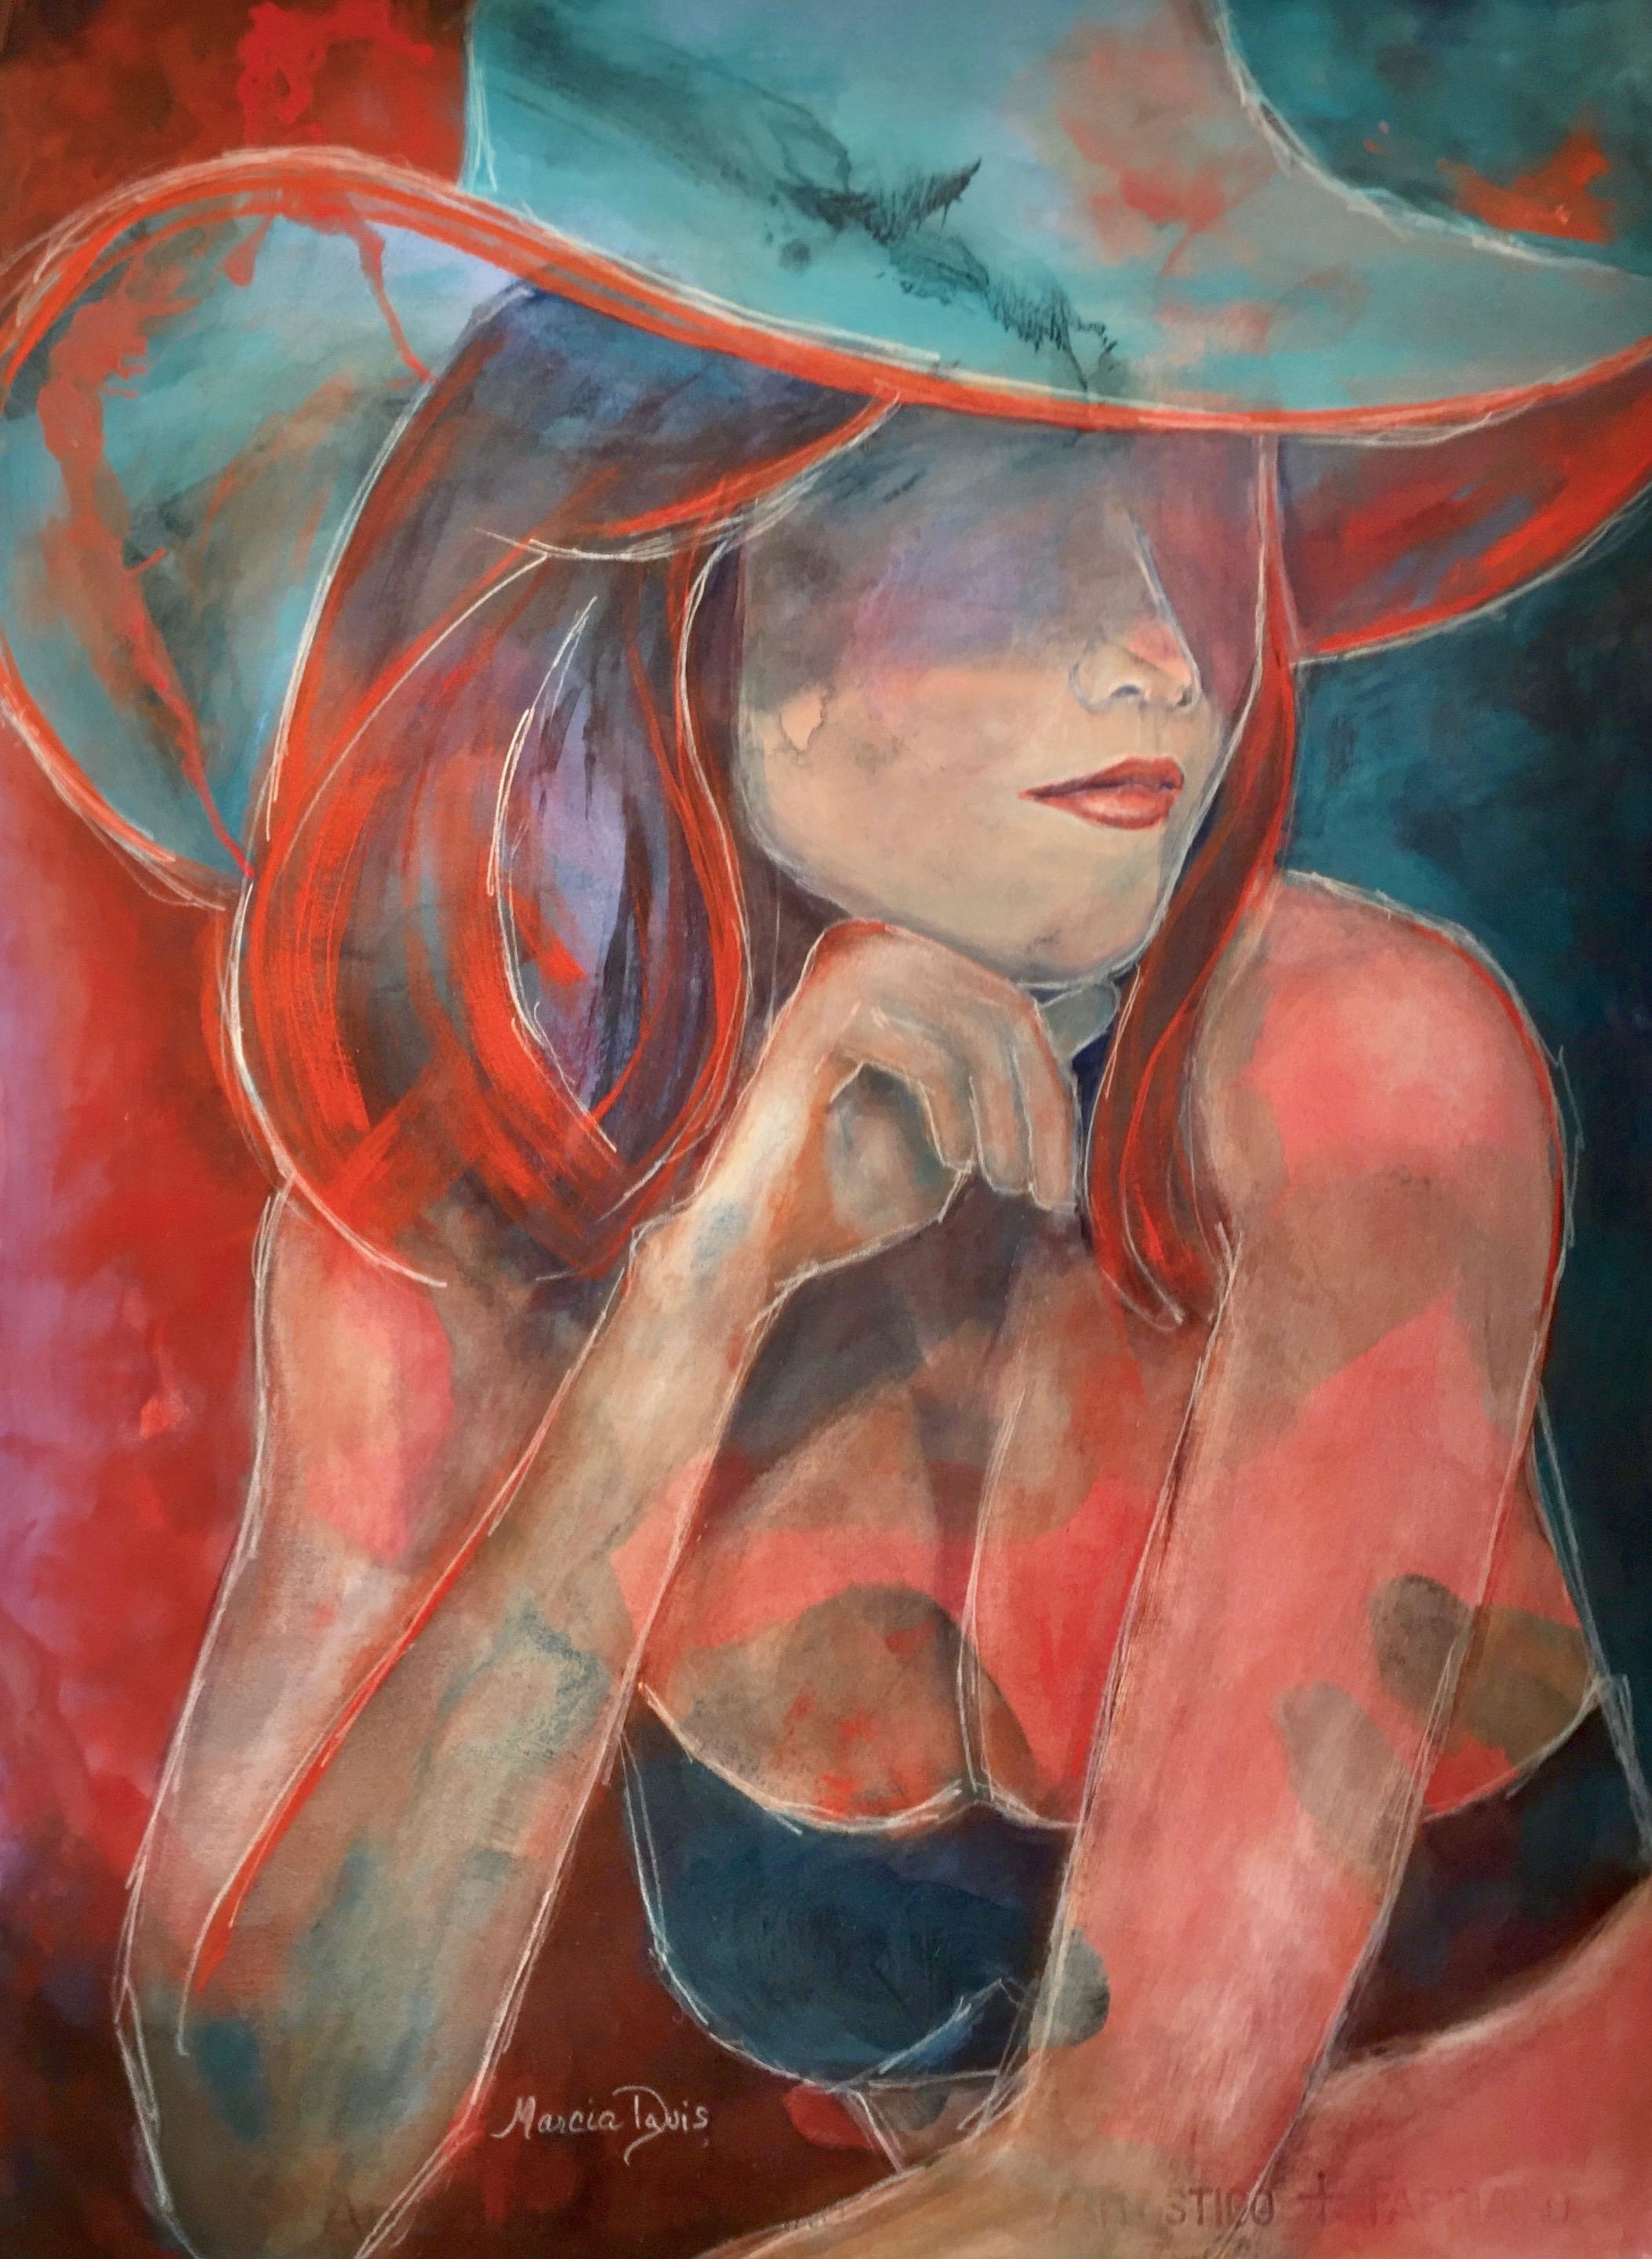 Azure dans le Rouge (Azure into Red)